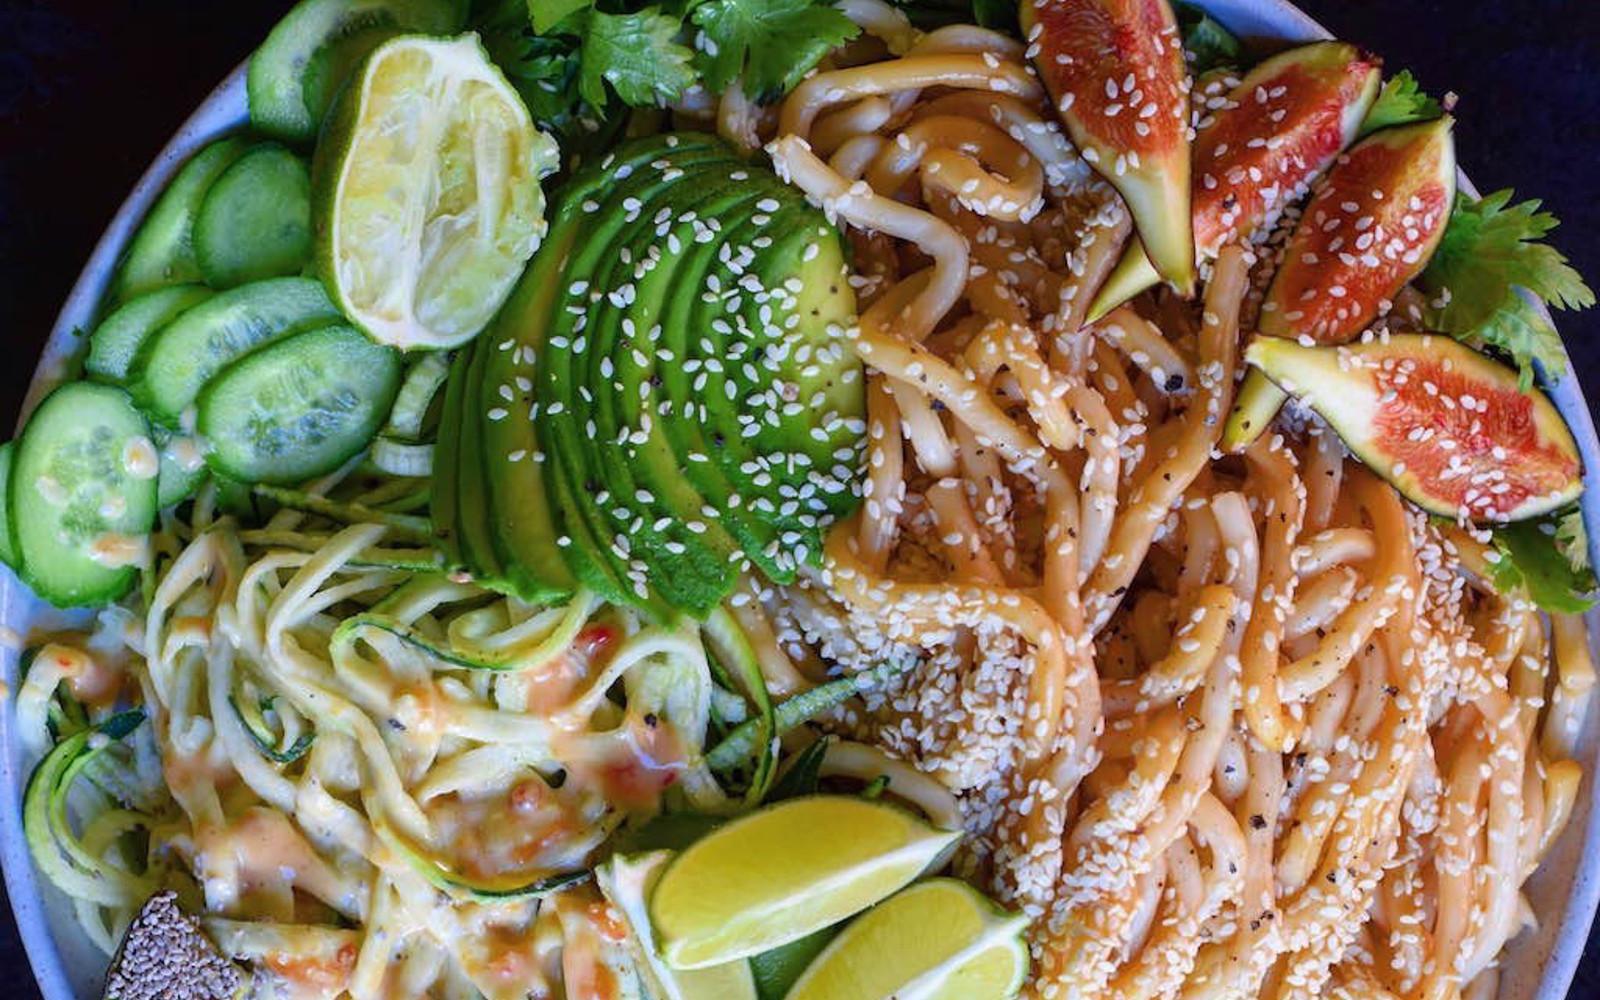 Spicy Peanut Udon Noodle Bowl